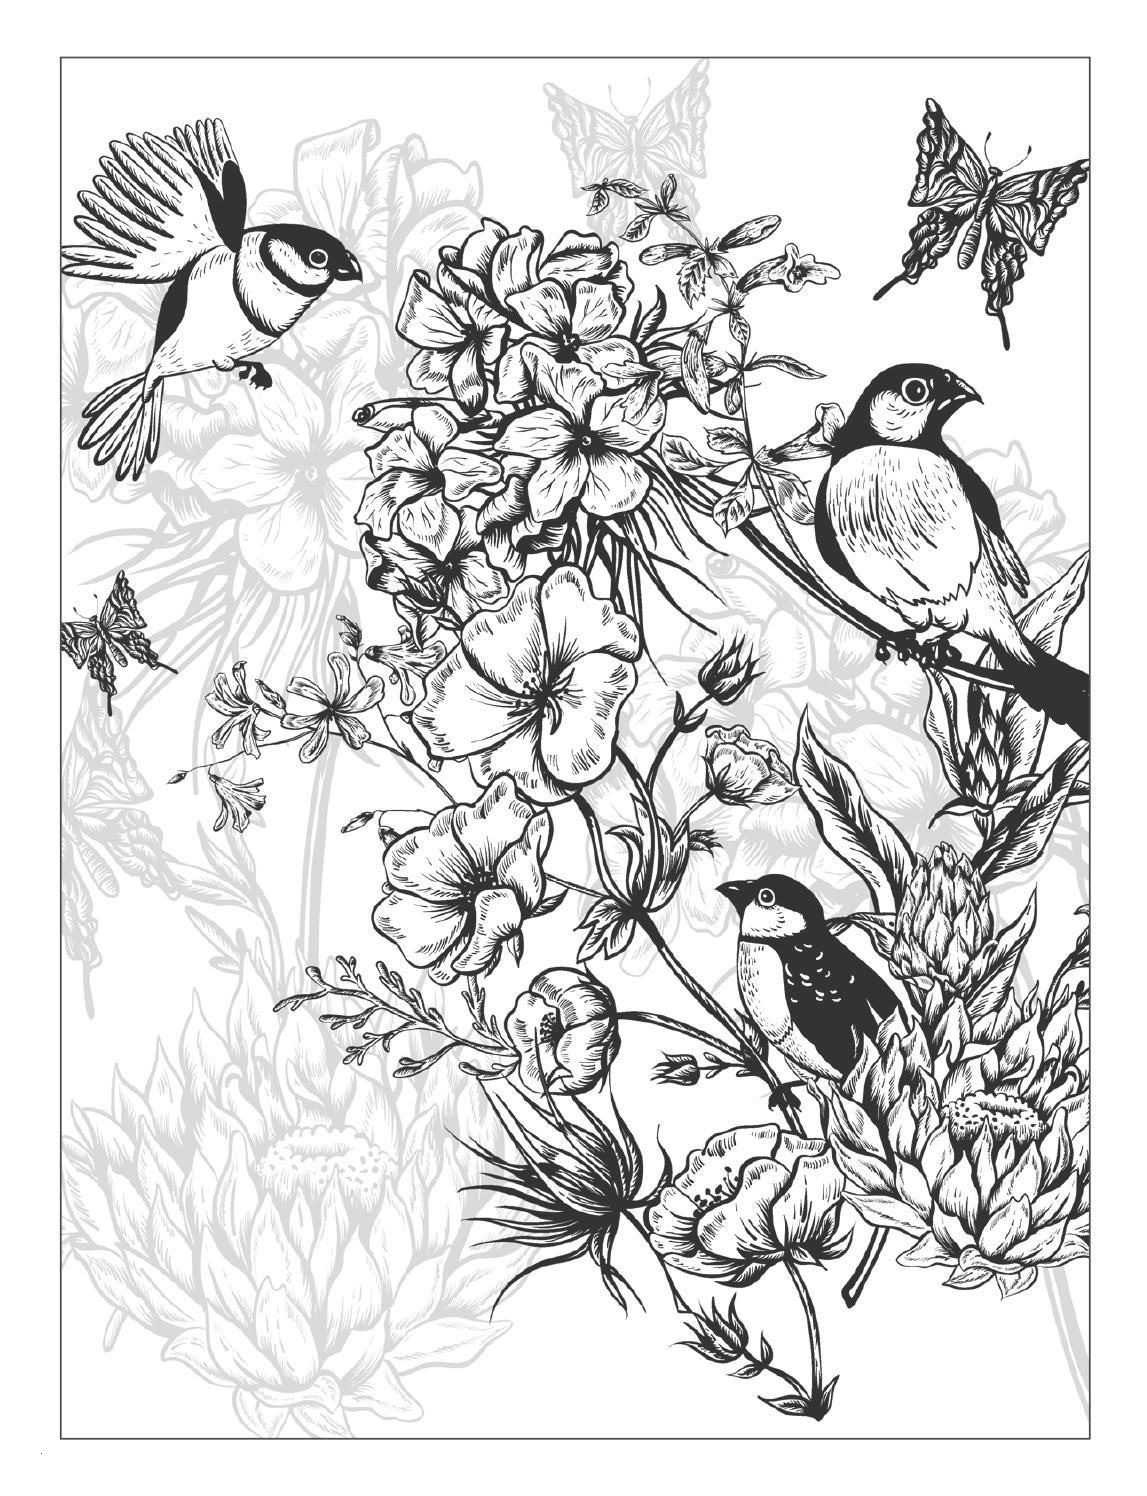 Sendung Mit Der Maus Ausmalbilder Frisch Beautiful Flowers Detailed Floral Designs Coloring Book Preview Galerie